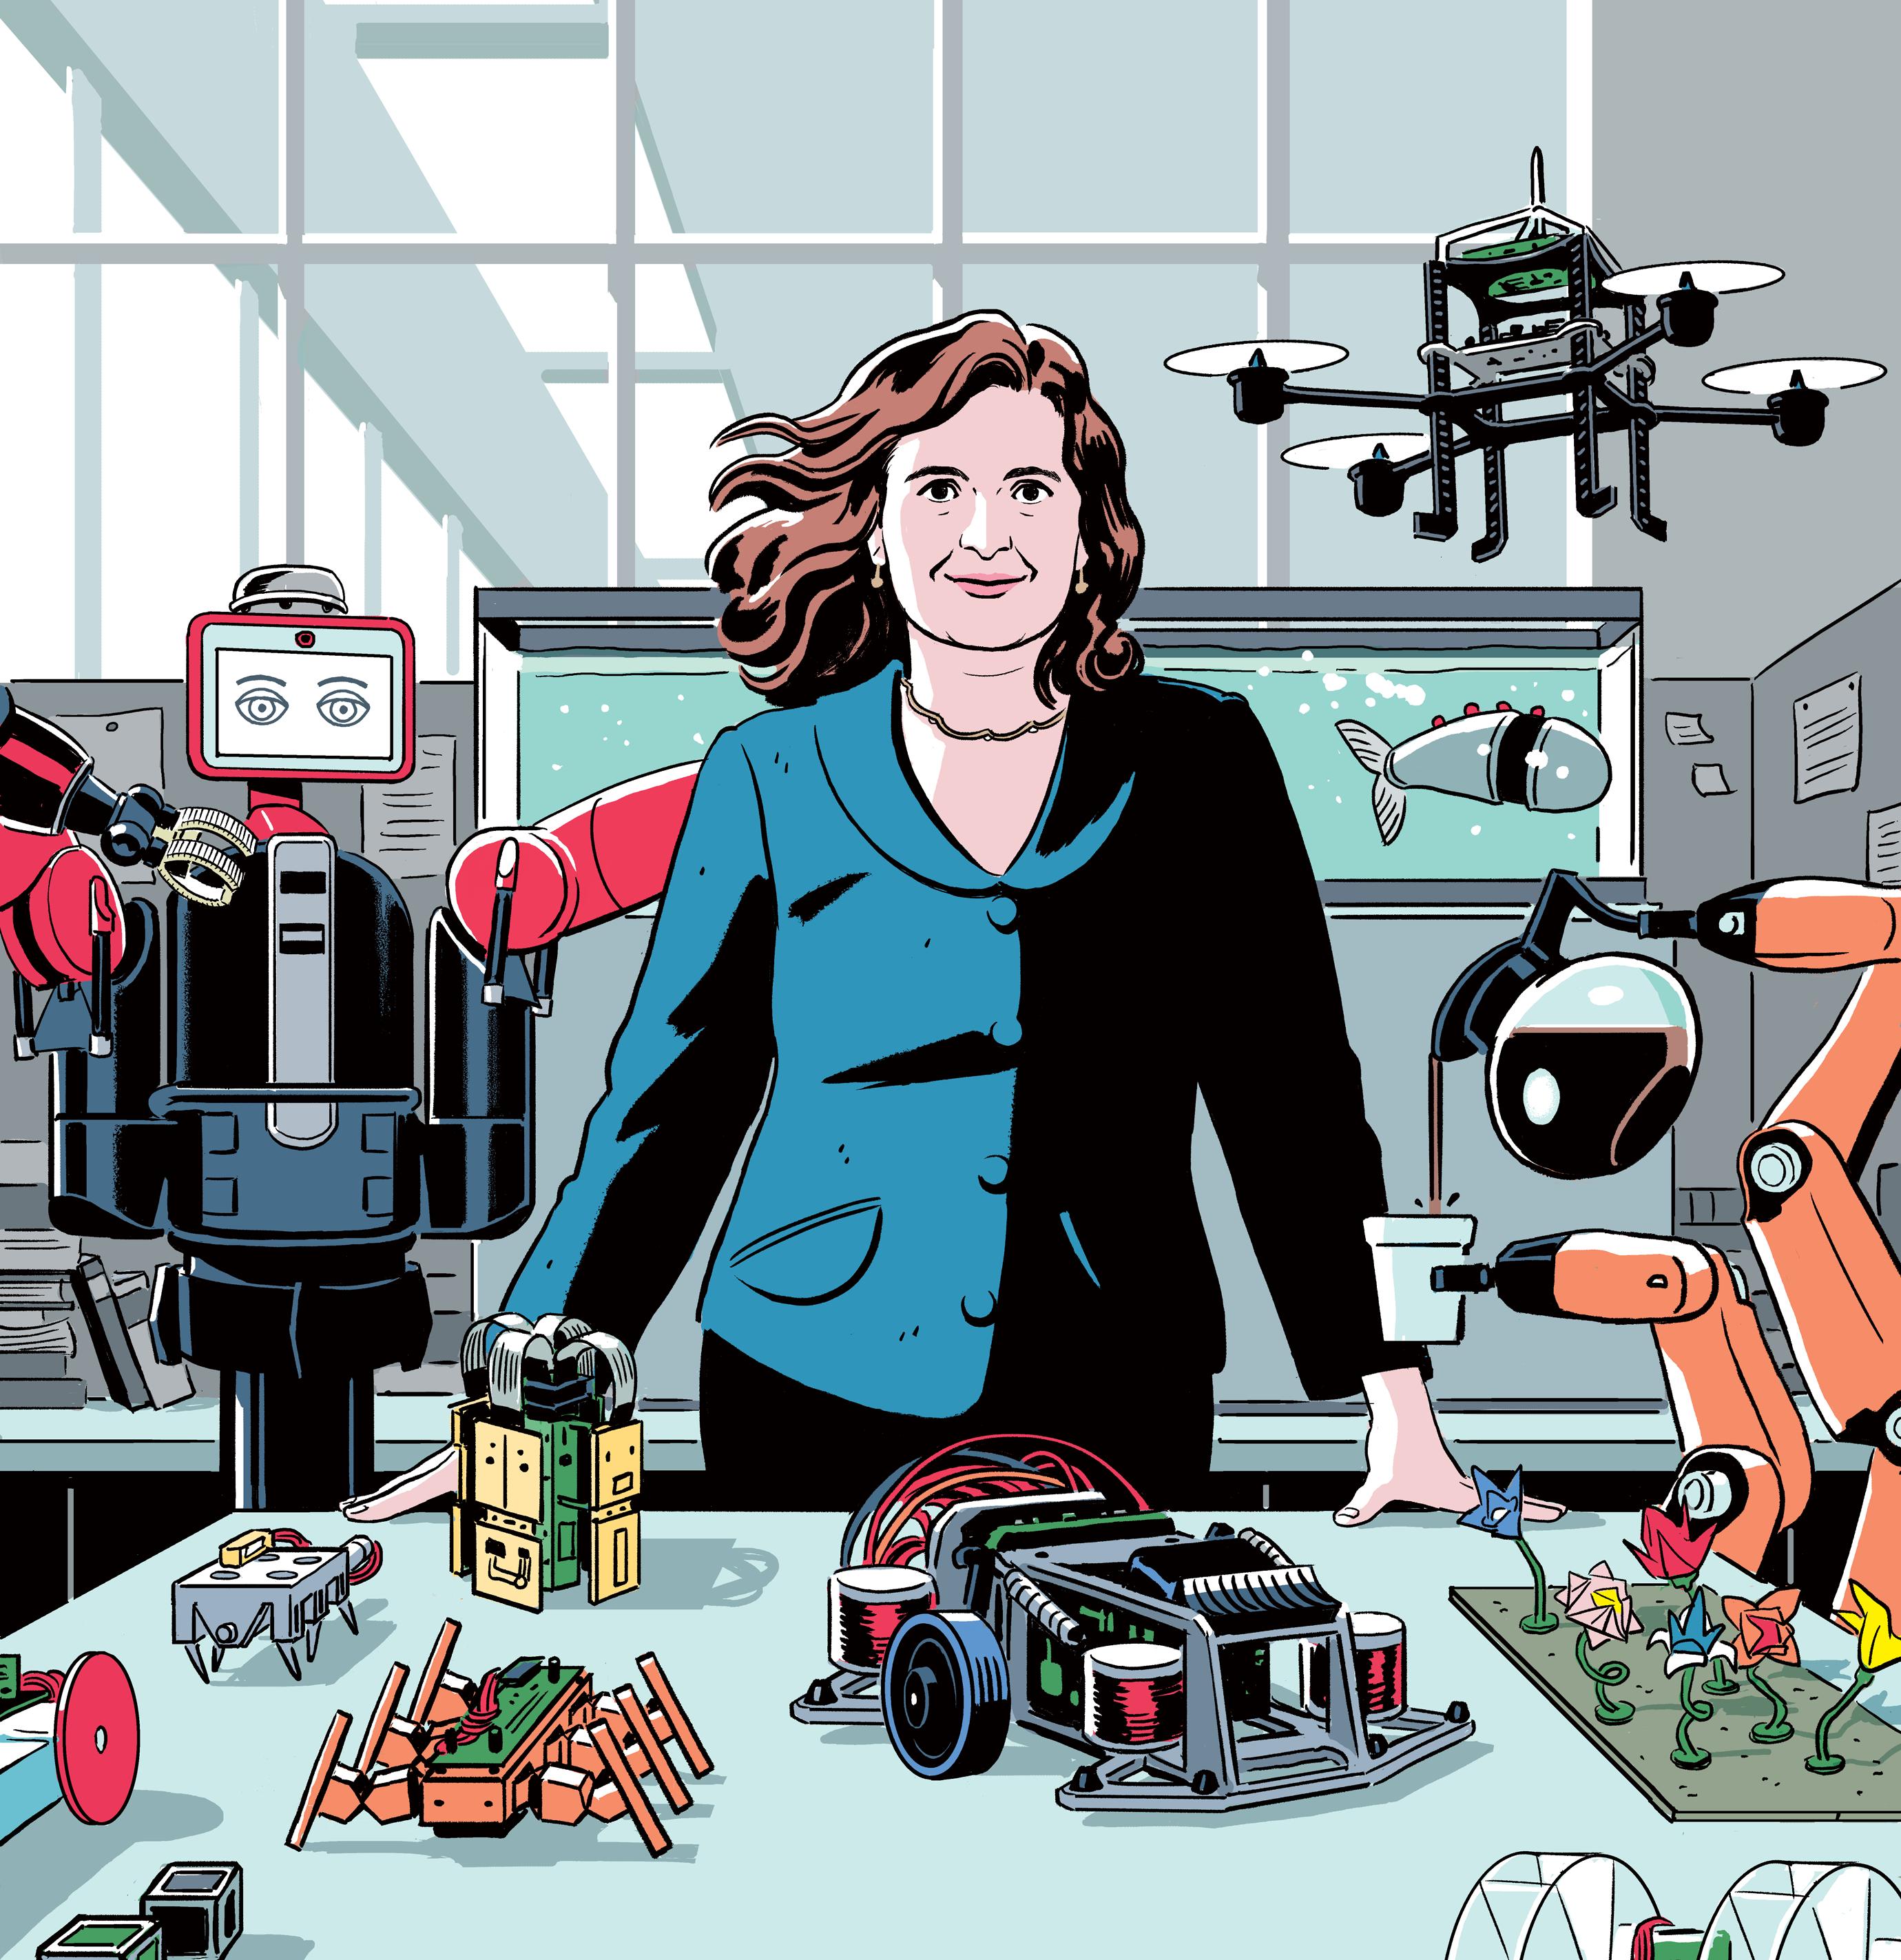 "<b><a href=""https://www.technologyreview.com/mit-news/2017/11/"">Daniela Rus: Building Tomorrow's Robots</a></b> <br> Illustration by R. Kikuo Johnson"